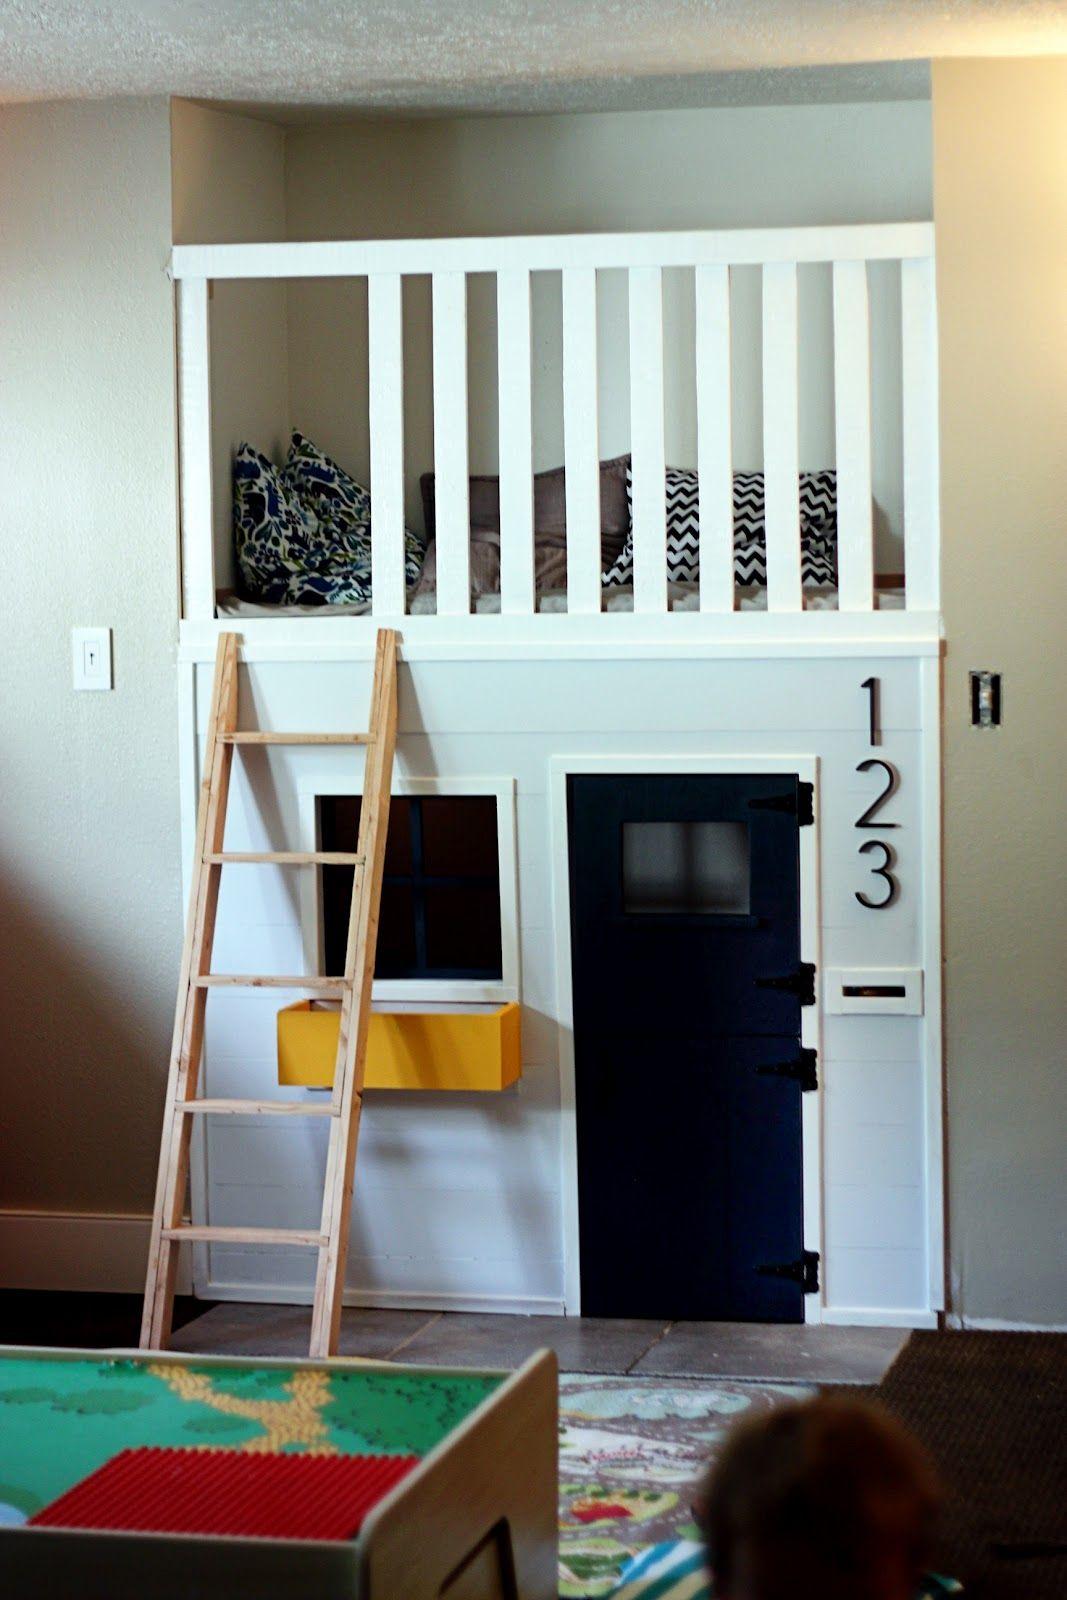 Loft play area idea - hack kura loft bed ??cccccccccoooooooooooooooooooooooooooooooooooooooooooooooooooooolllllllllllllllllllllllllllllllllllllllllllllllllllllllllllllllllllllllllllllllllllllllllllllllllllllllllllllllllllllllllllllllllllllllllllllllllll